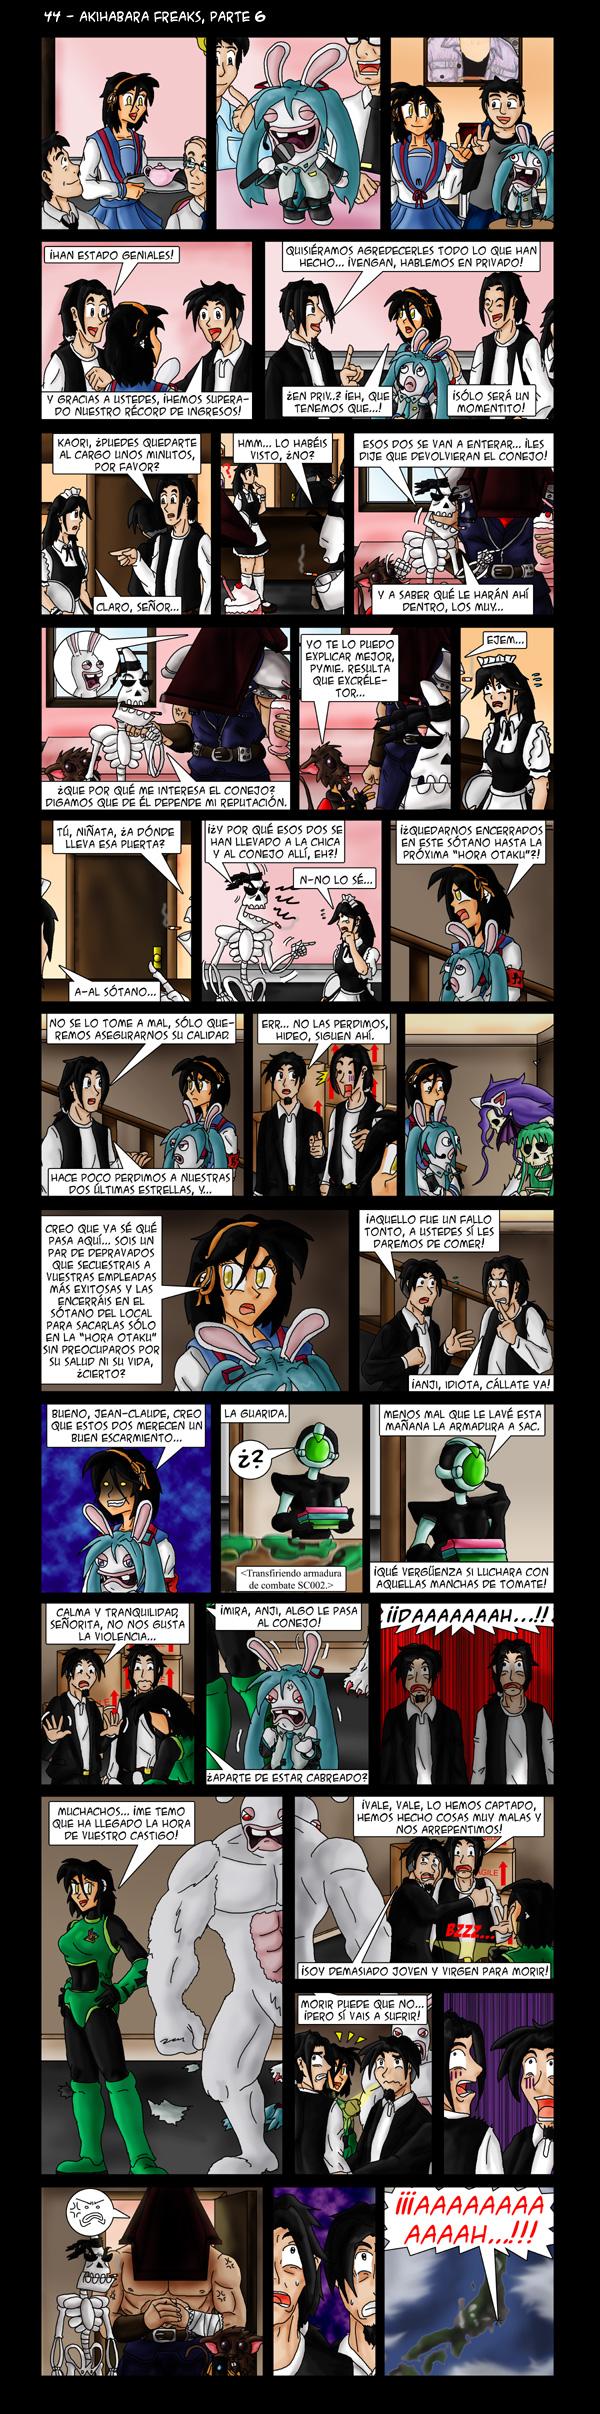 44 – Akihabara Freaks, parte 6